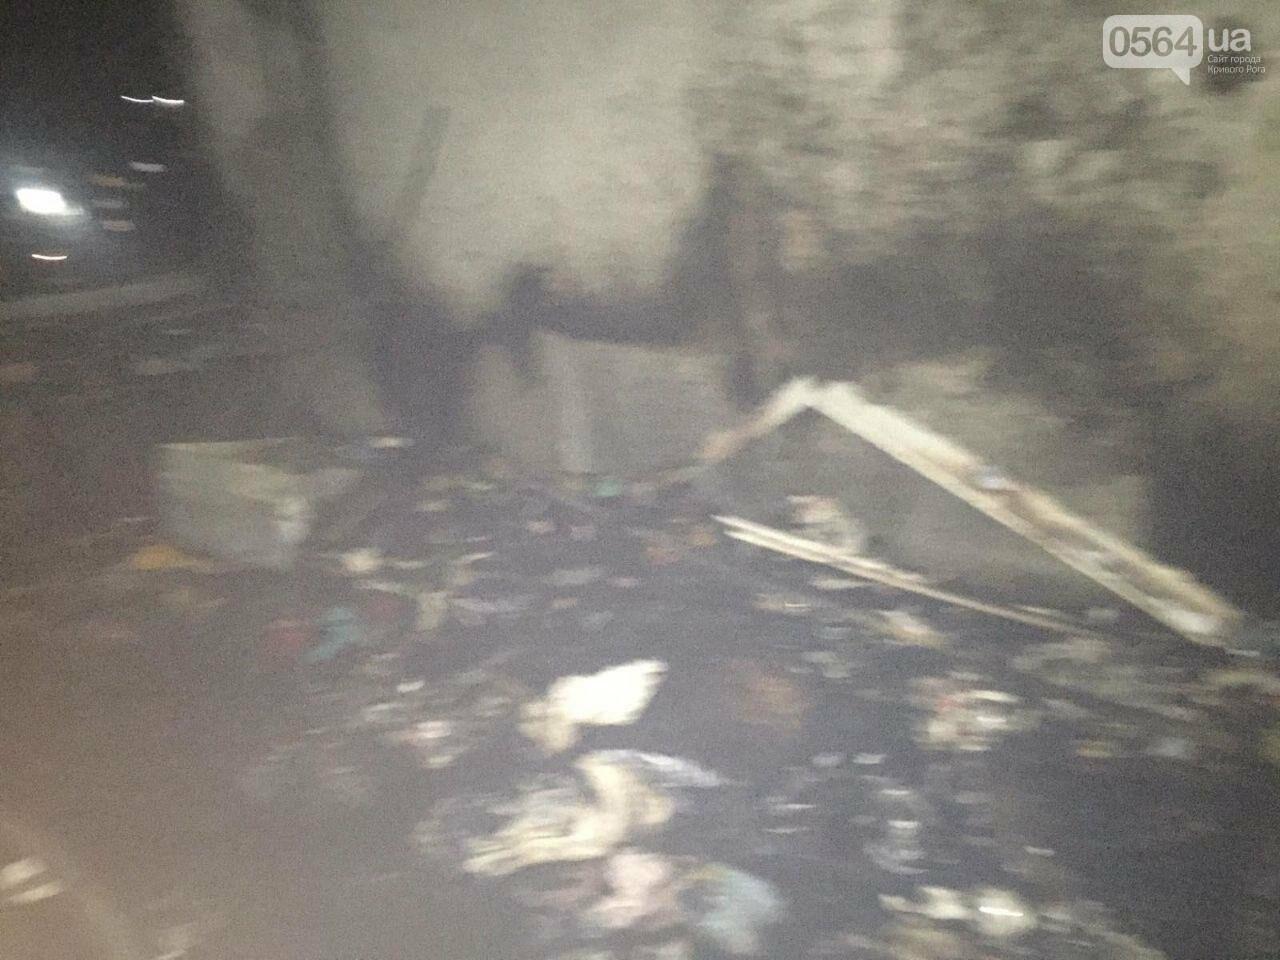 В Кривом Роге загорелась квартира на 6 этаже. Найдено тело мужчины, - ФОТО 18+, ВИДЕО, ОБНОВЛЕНО, фото-1